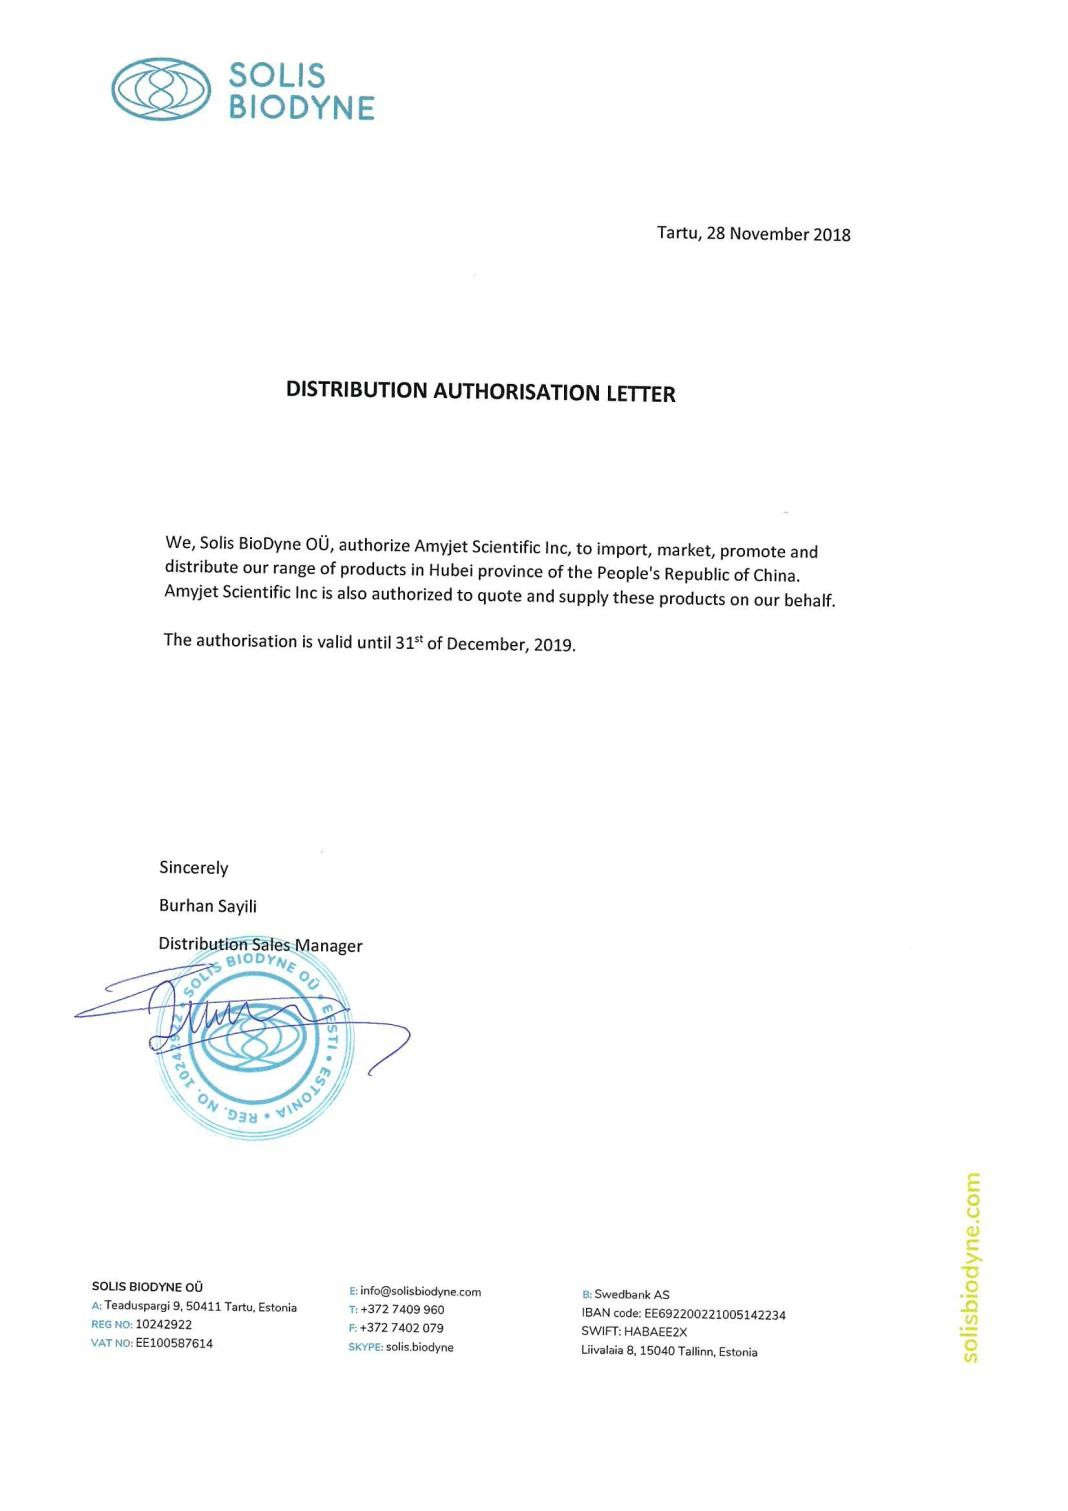 Solis BioDyne代理艾美捷科技有限公司授权书